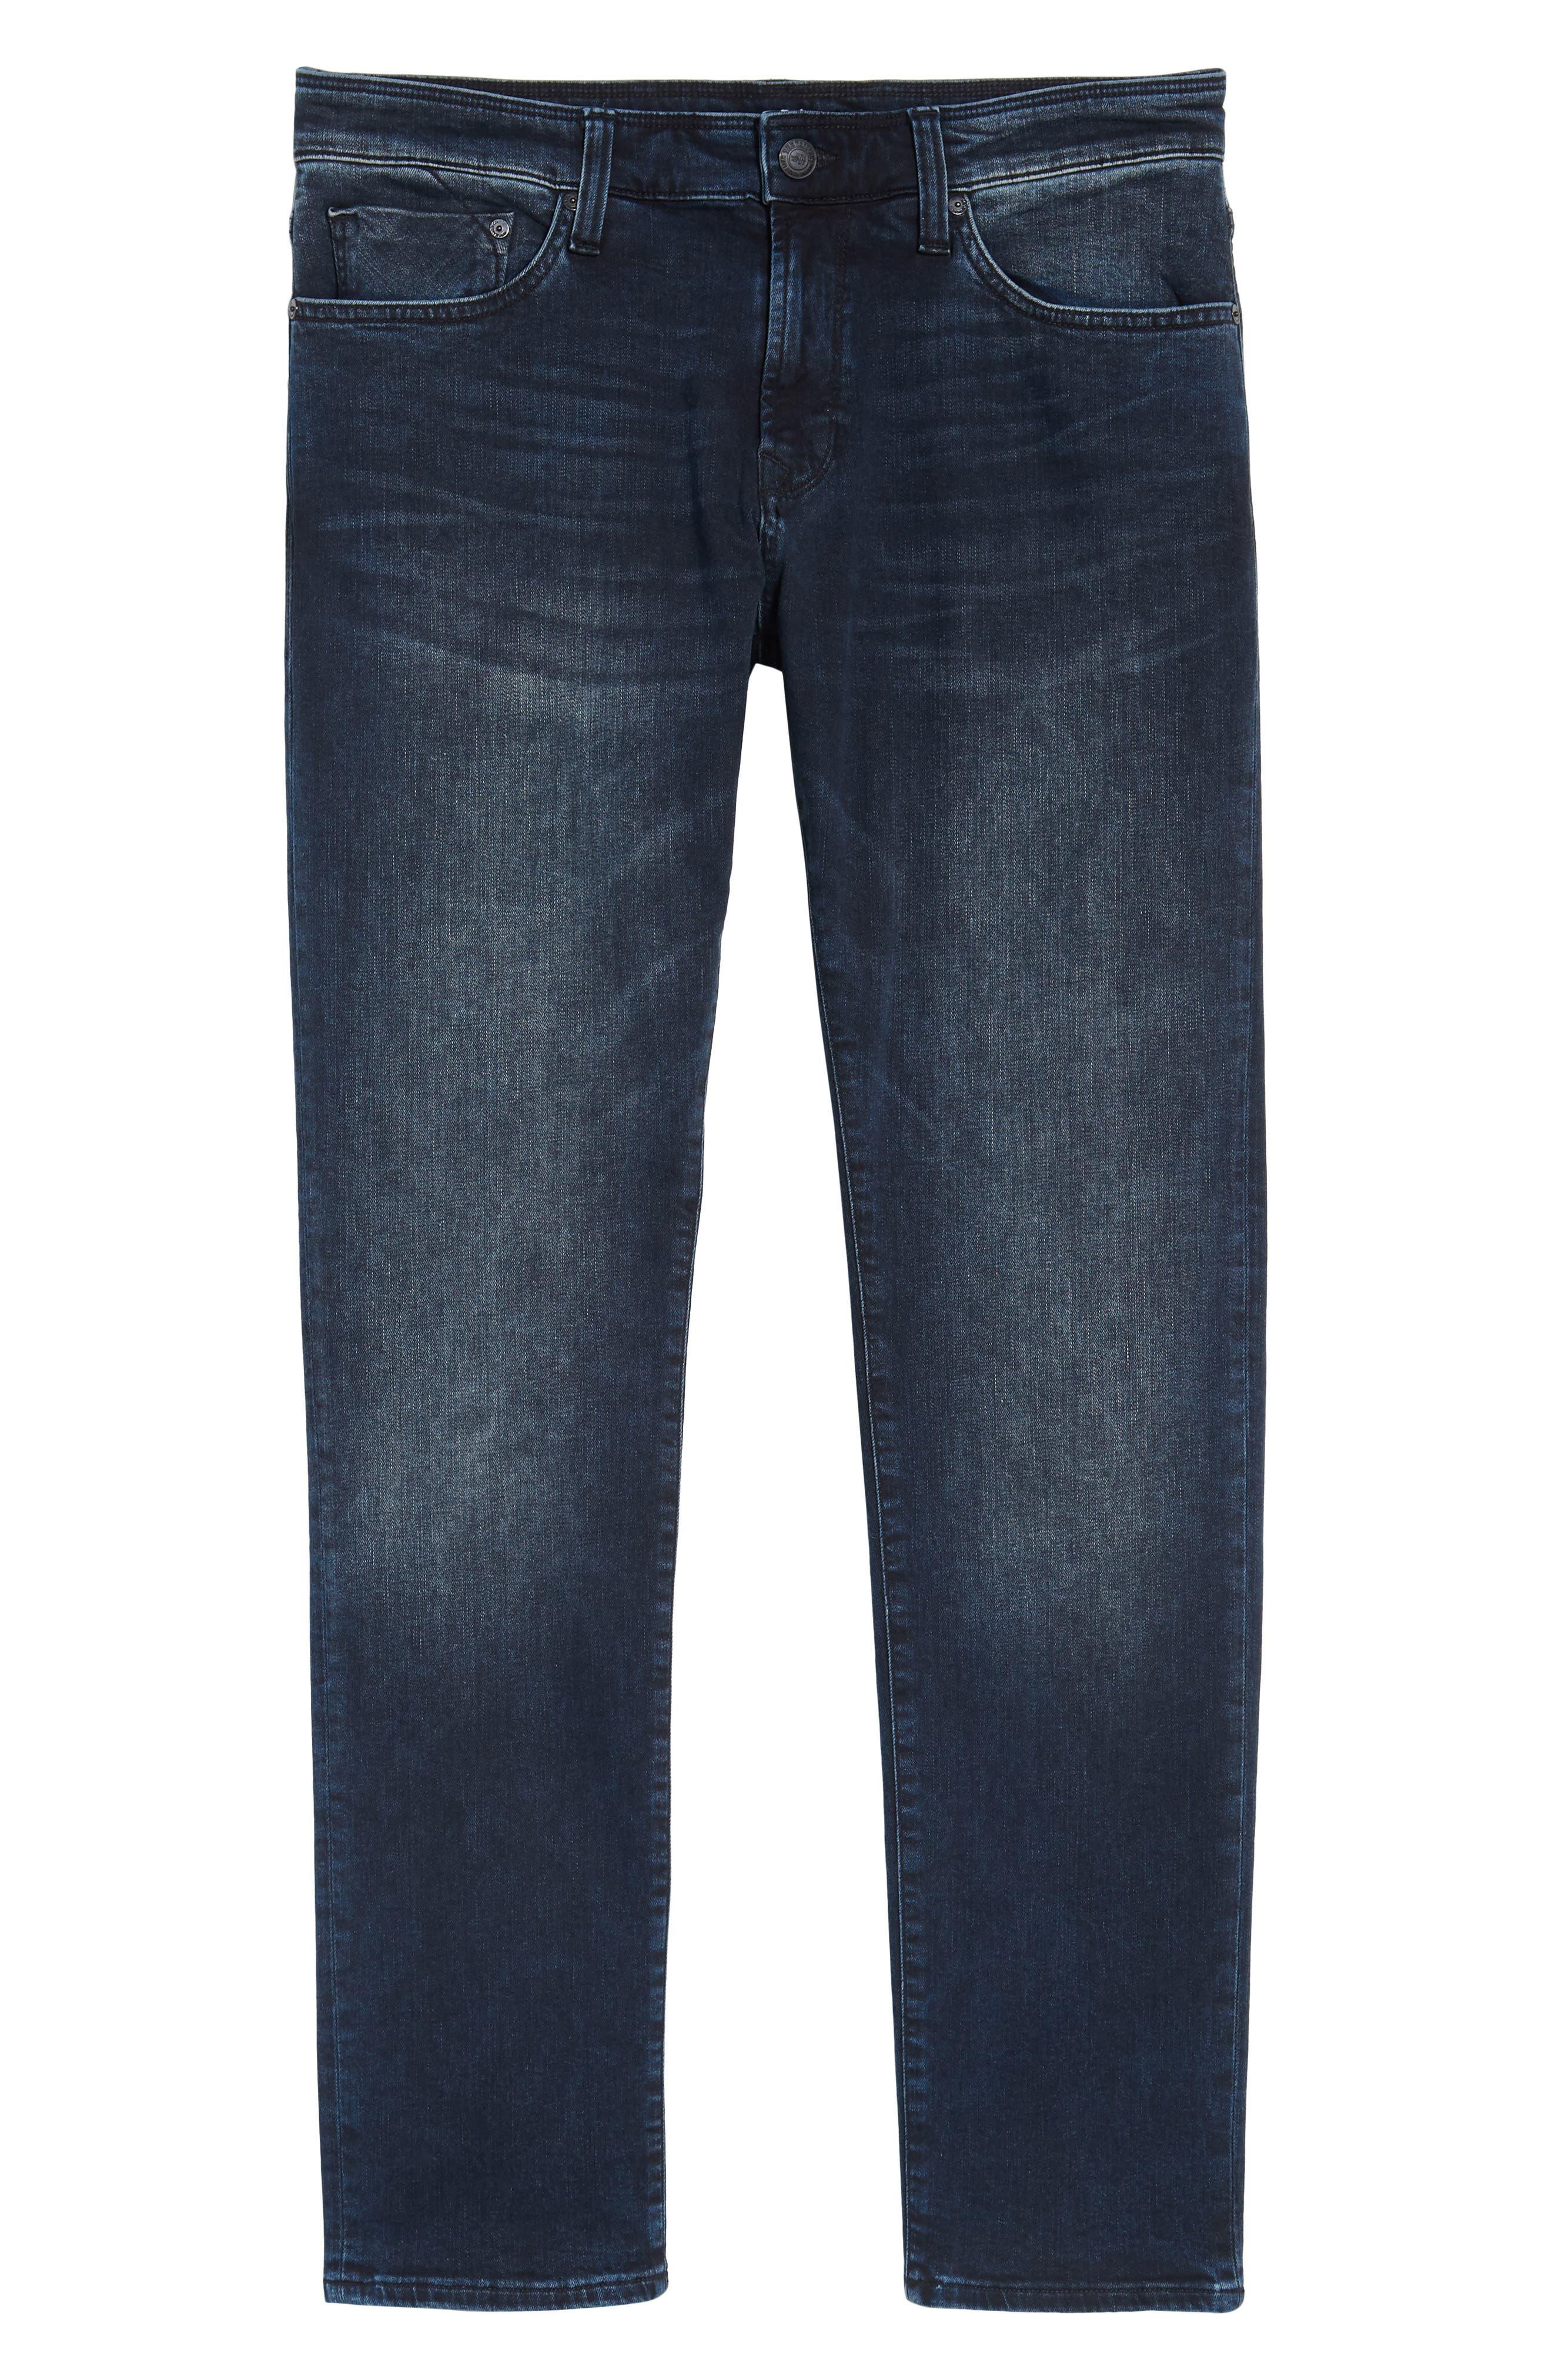 Jake Slim Fit Jeans,                             Alternate thumbnail 6, color,                             Ink Used Authentic Vintage